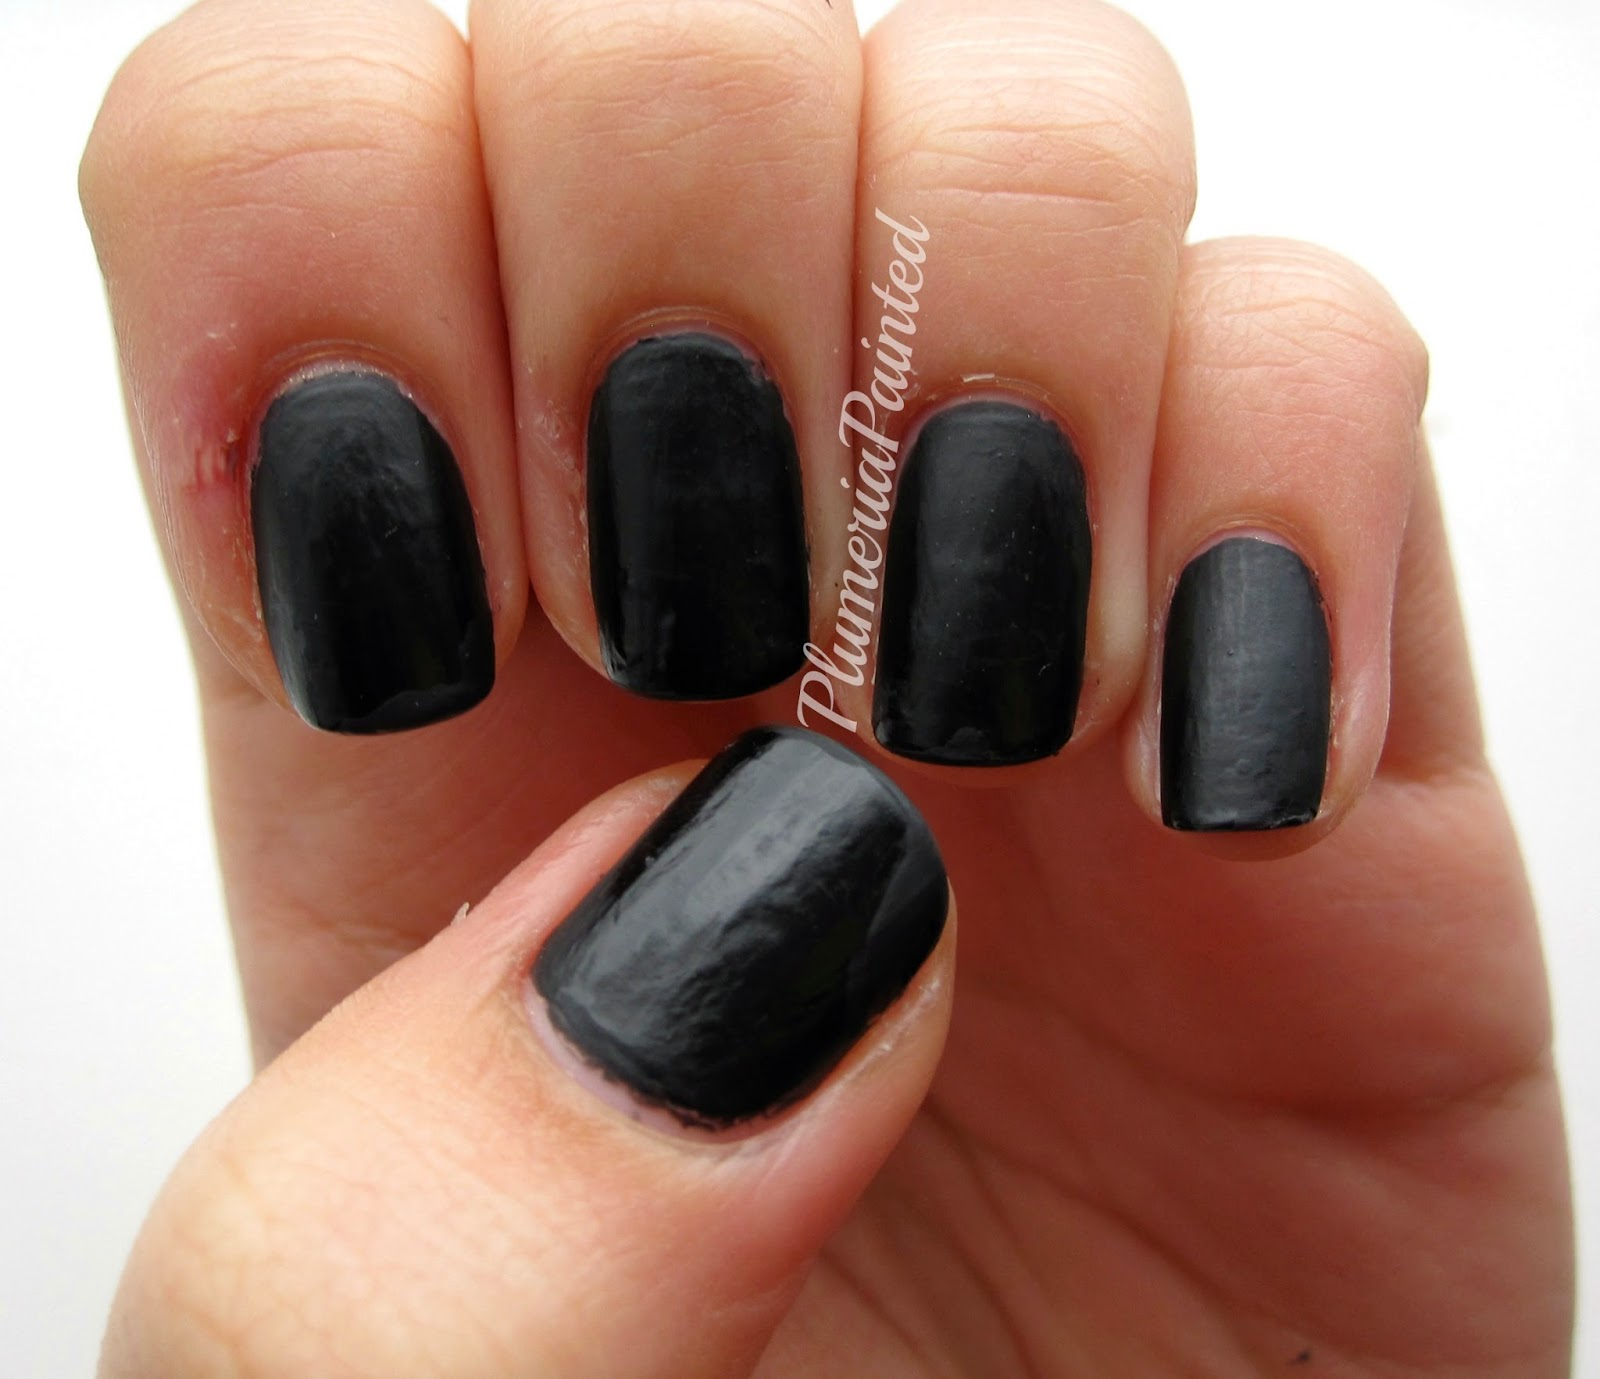 Chalkboard Nail Polish: PlumeriaPainted: Black Nails: Ciaté